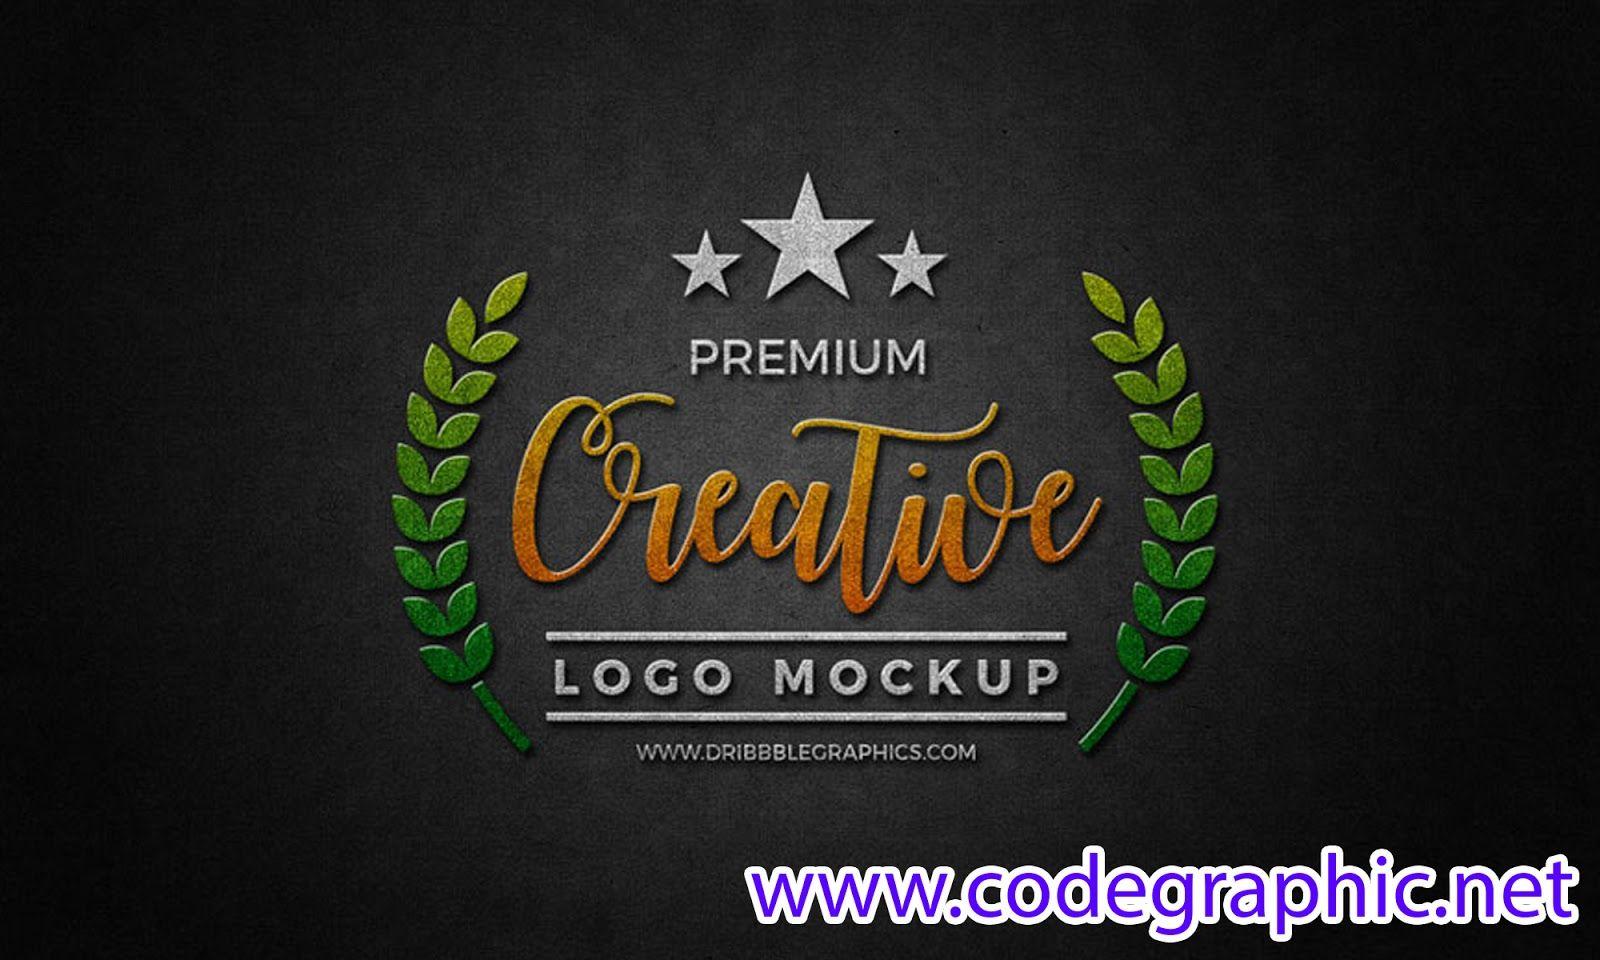 Free Download Logo Branding Mockup PSD File 2019 Code